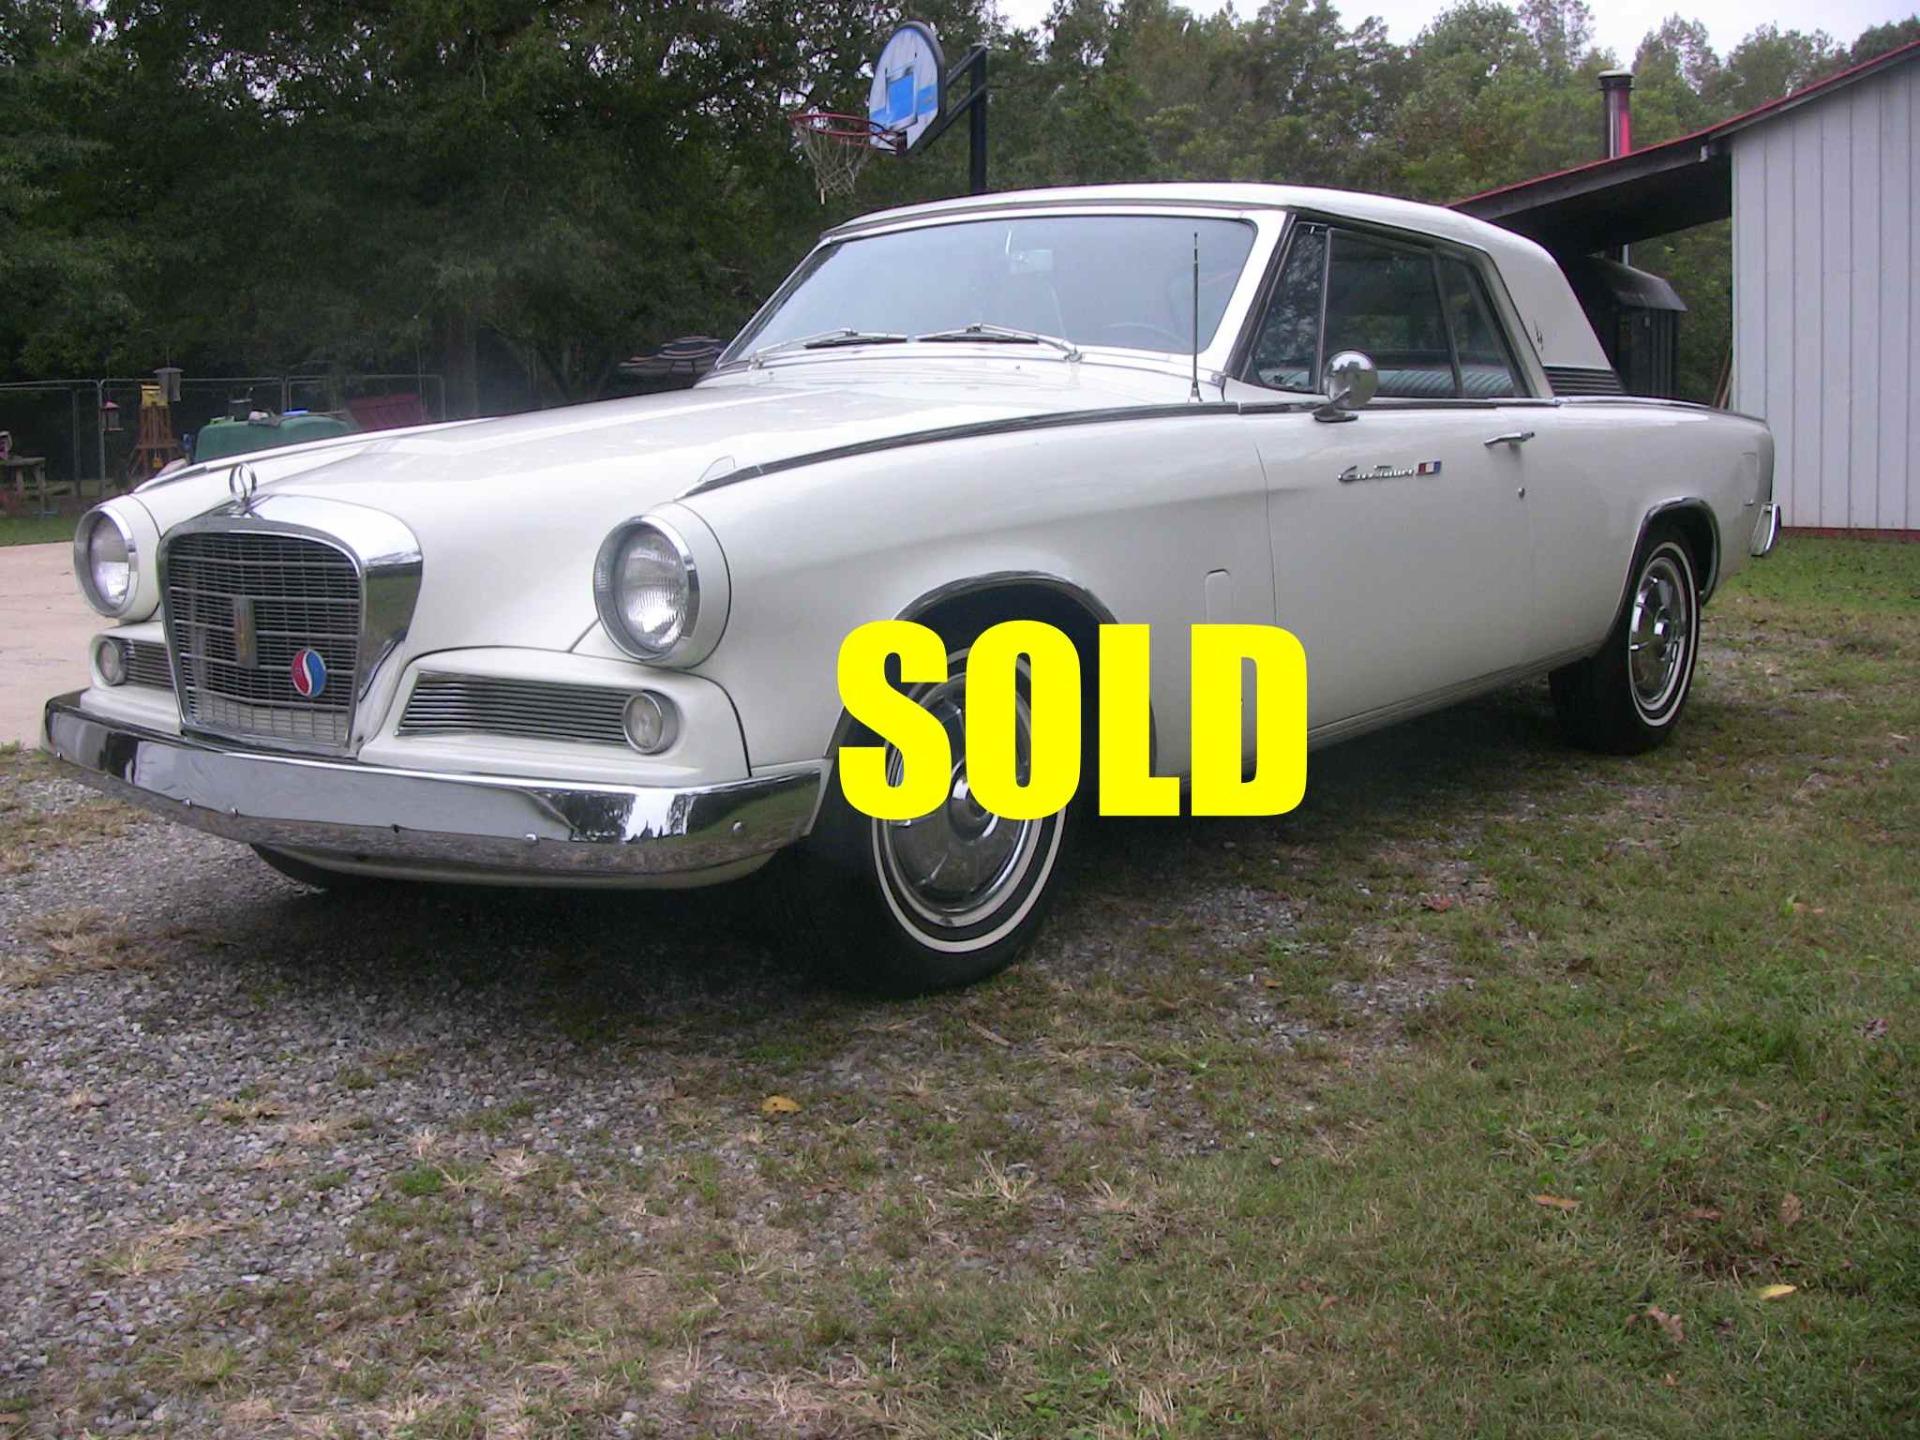 Used 1964 Studebaker Gran Turismo Hawk  149 , For Sale $39500, Call Us: (704) 996-3735